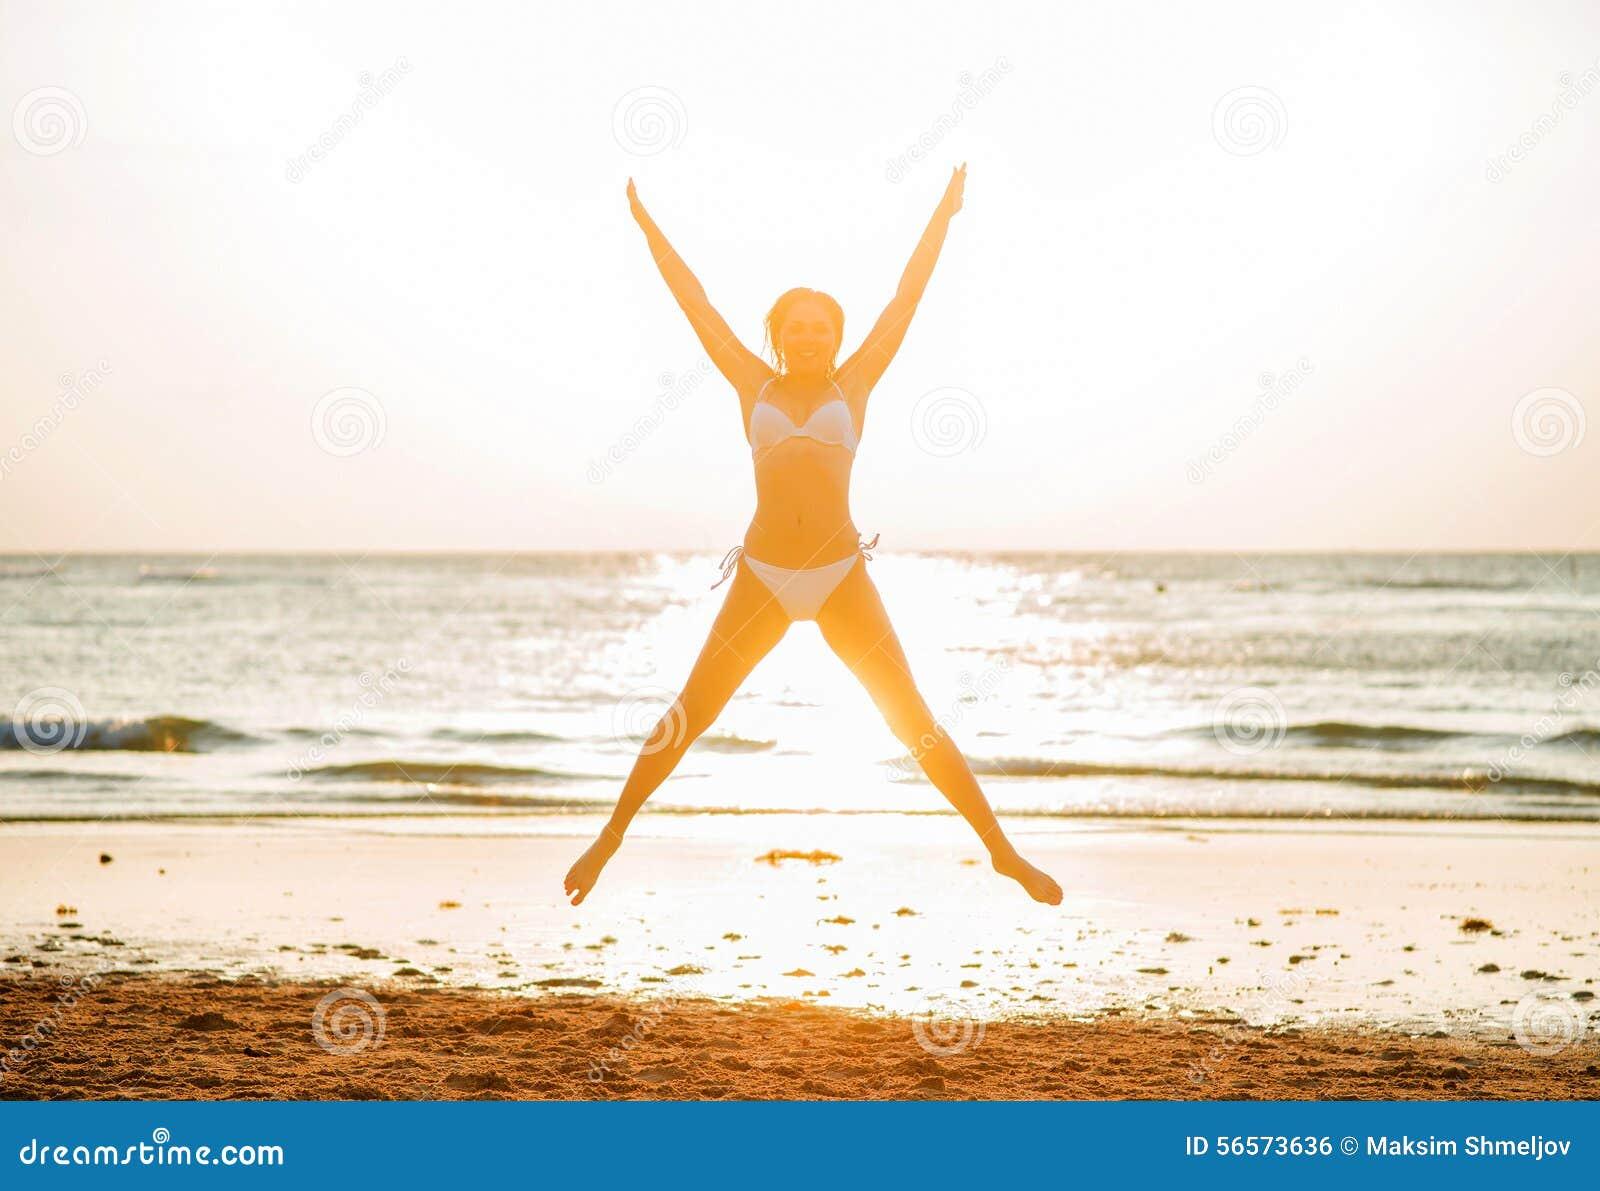 Download Όμορφη γυναίκα που στέκεται μπροστά από το ηλιοβασίλεμα στην παραλία Στοκ Εικόνες - εικόνα από ευτυχία, καλοκαίρι: 56573636